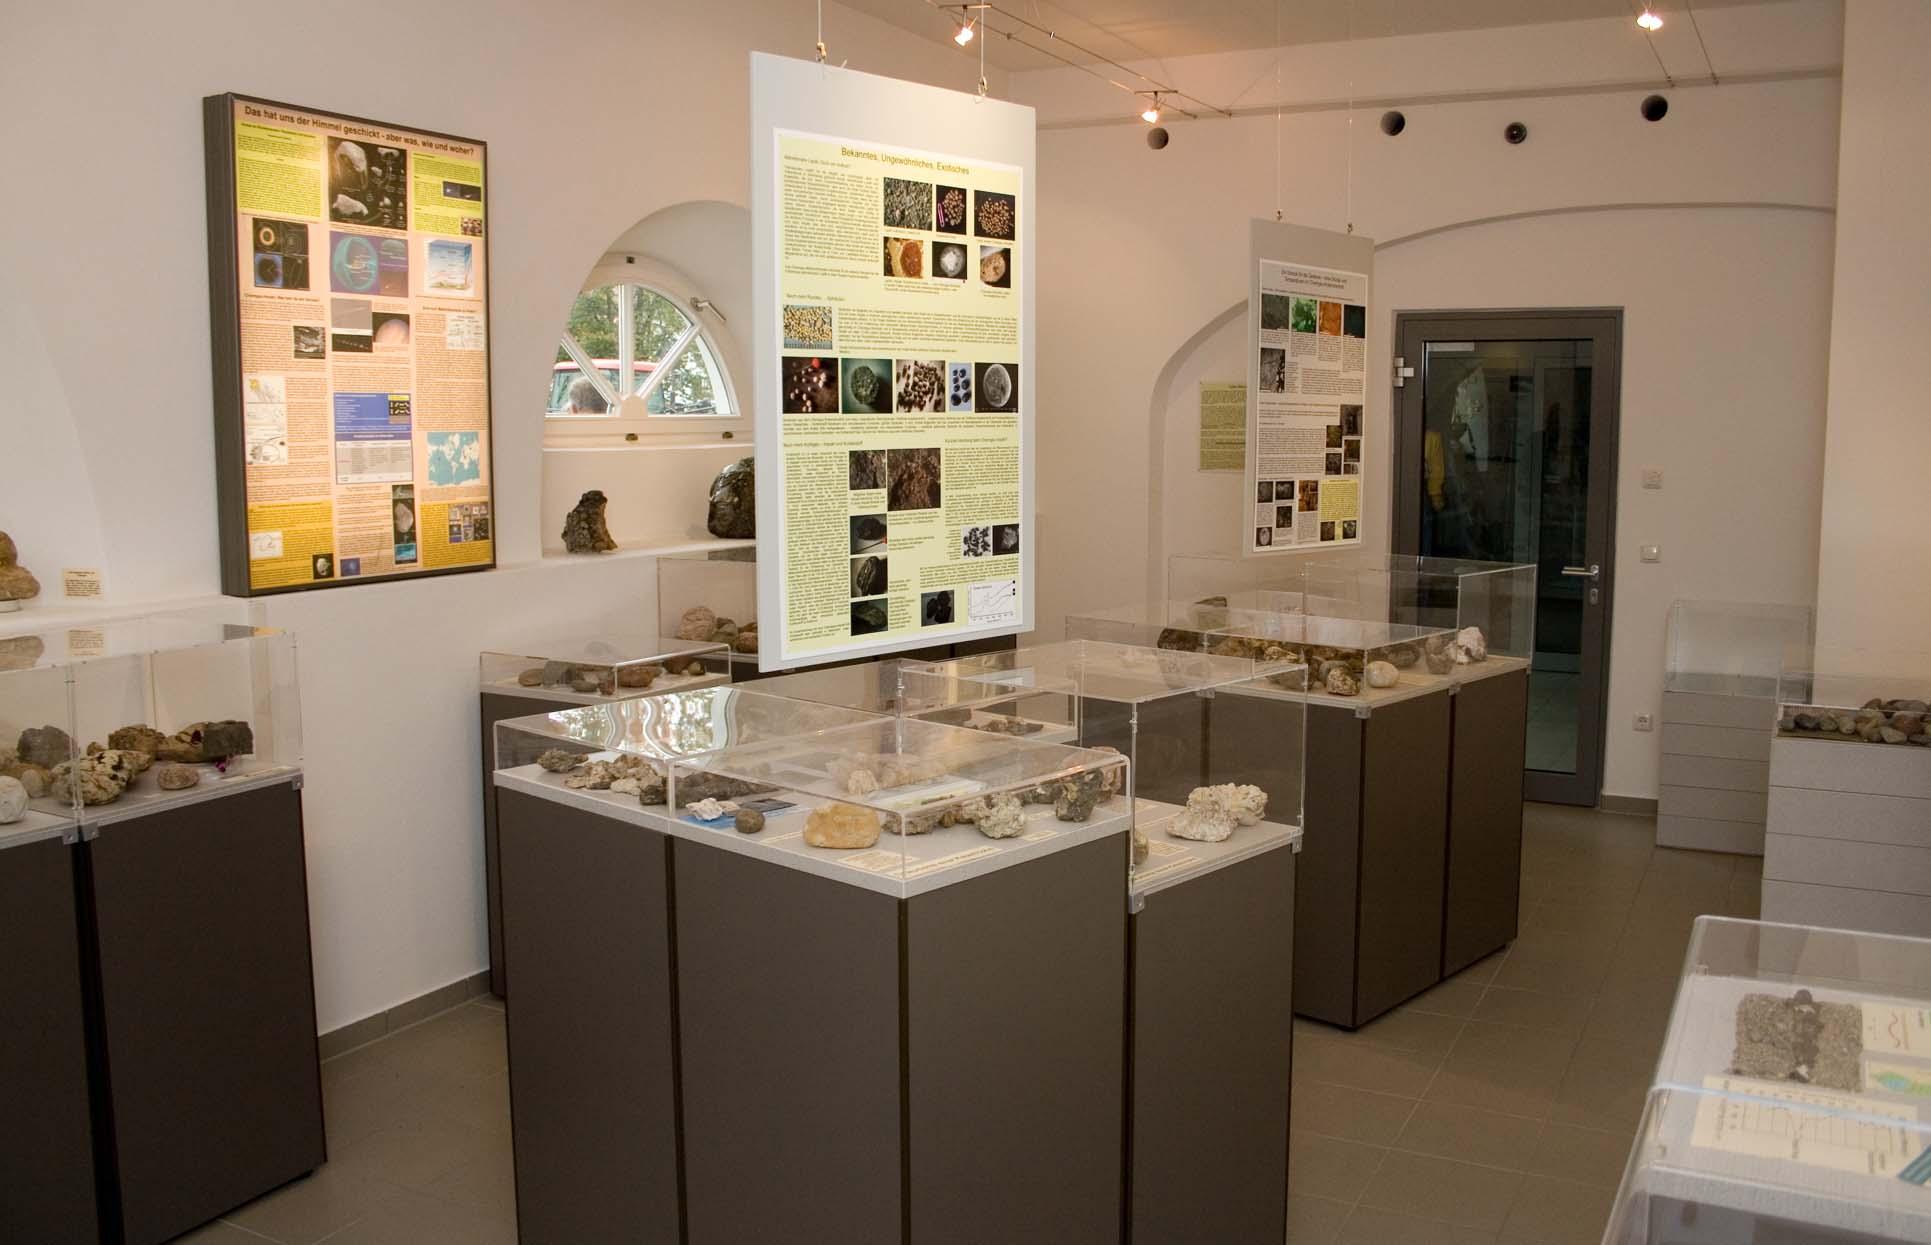 Impaktmuseum Rathaus Grabenstätt ganzjährig geöffnet